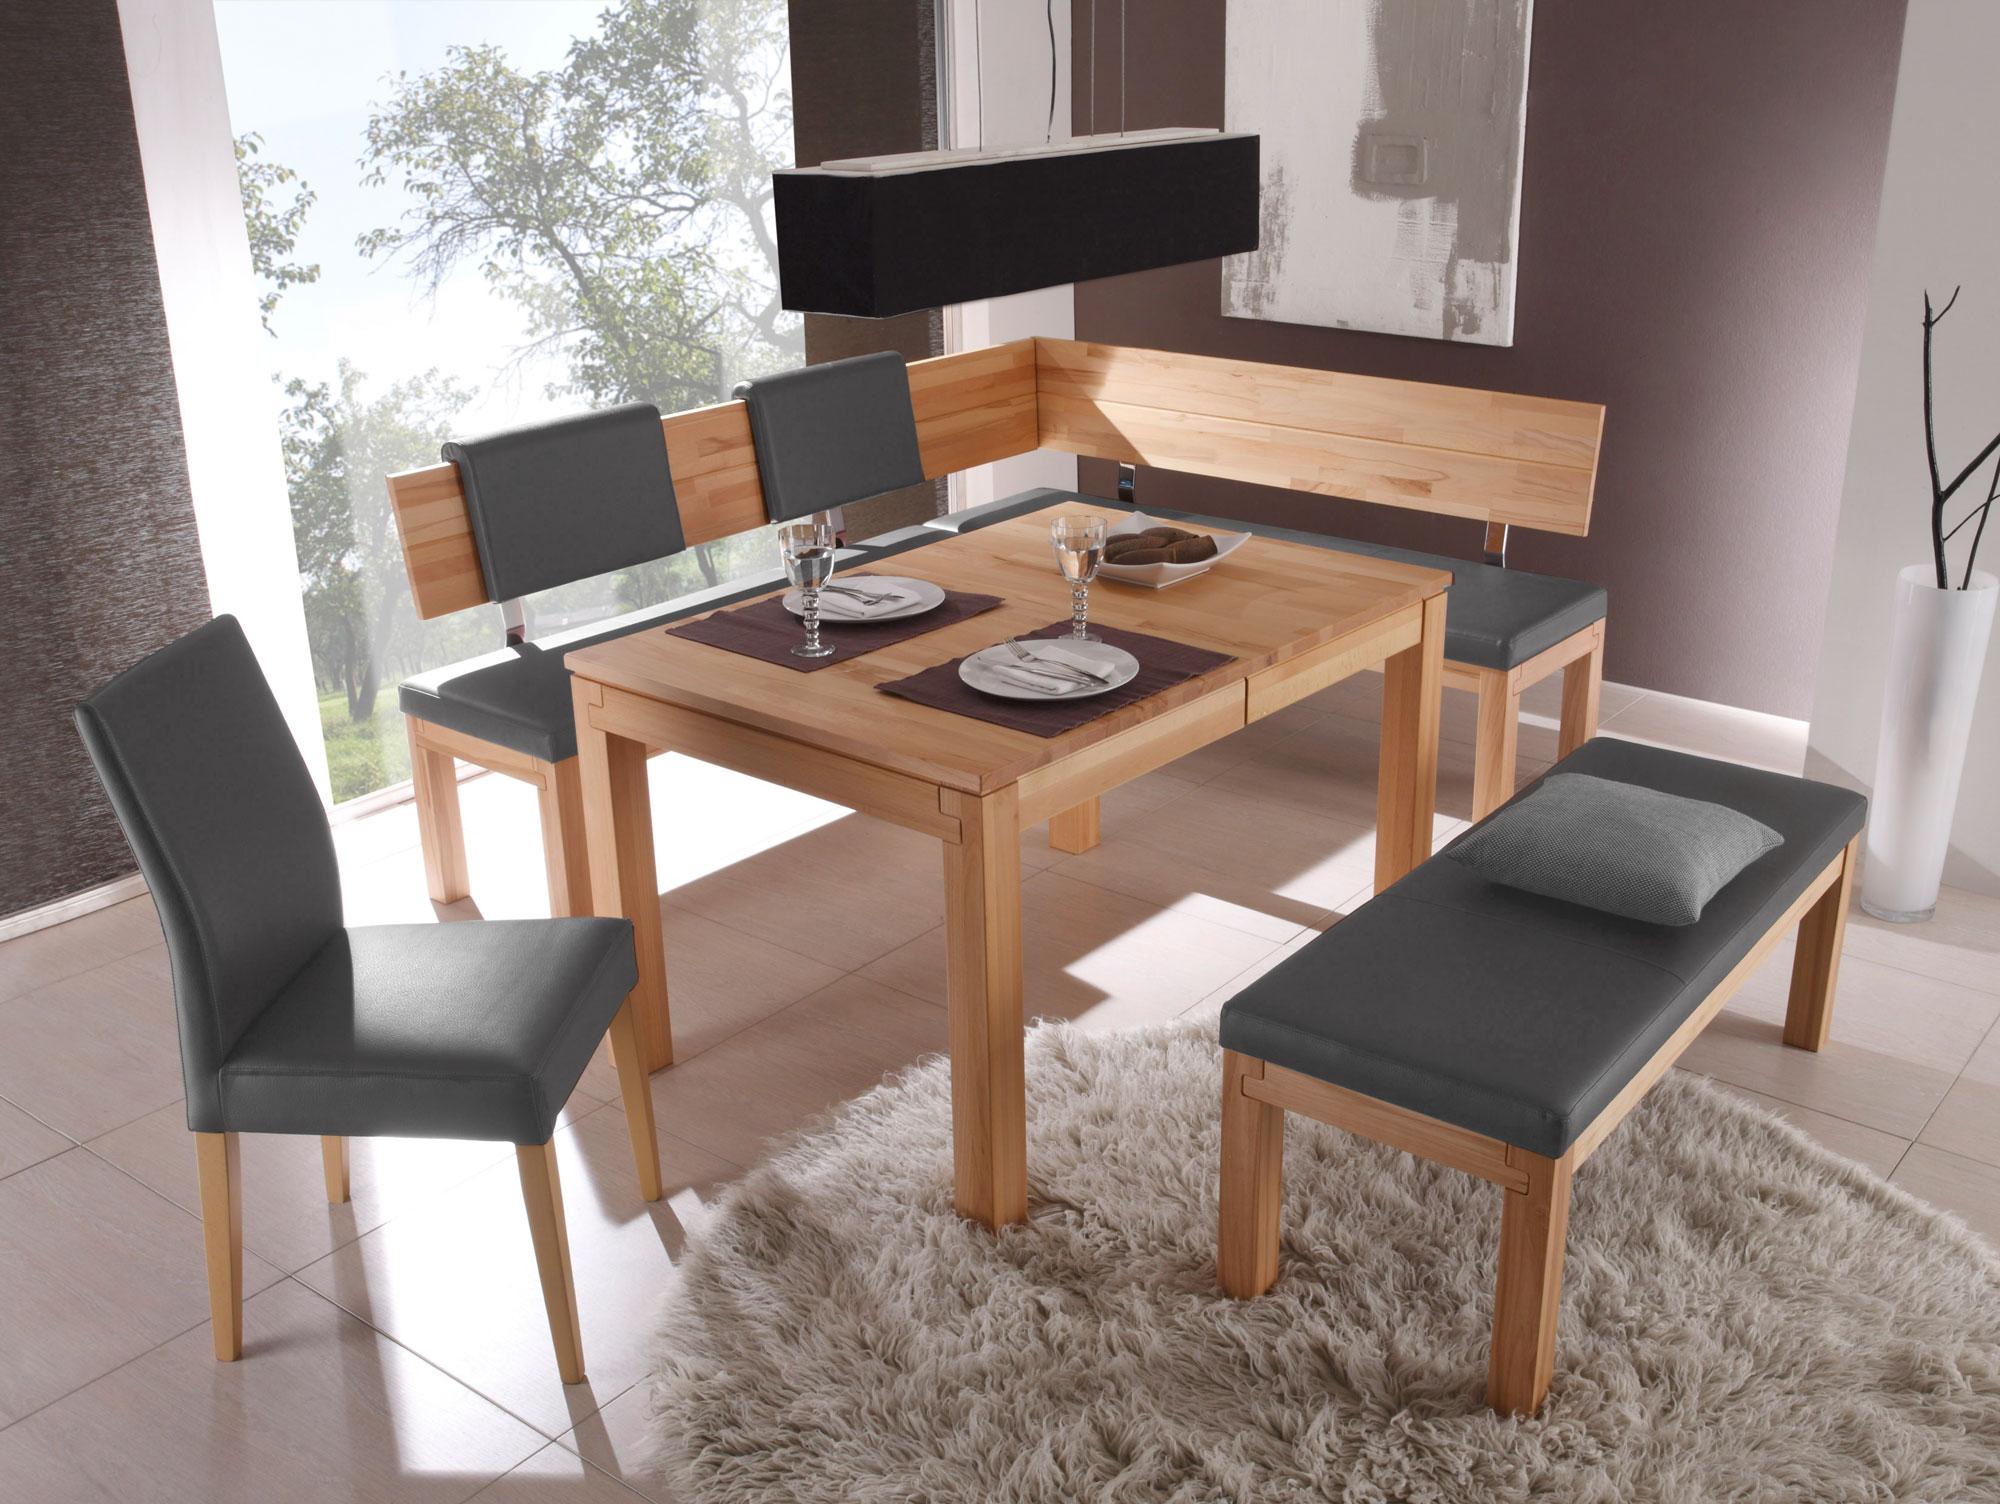 salima sitzbank mit r cken massivholz 130 cm kernbuche lackiert grau. Black Bedroom Furniture Sets. Home Design Ideas